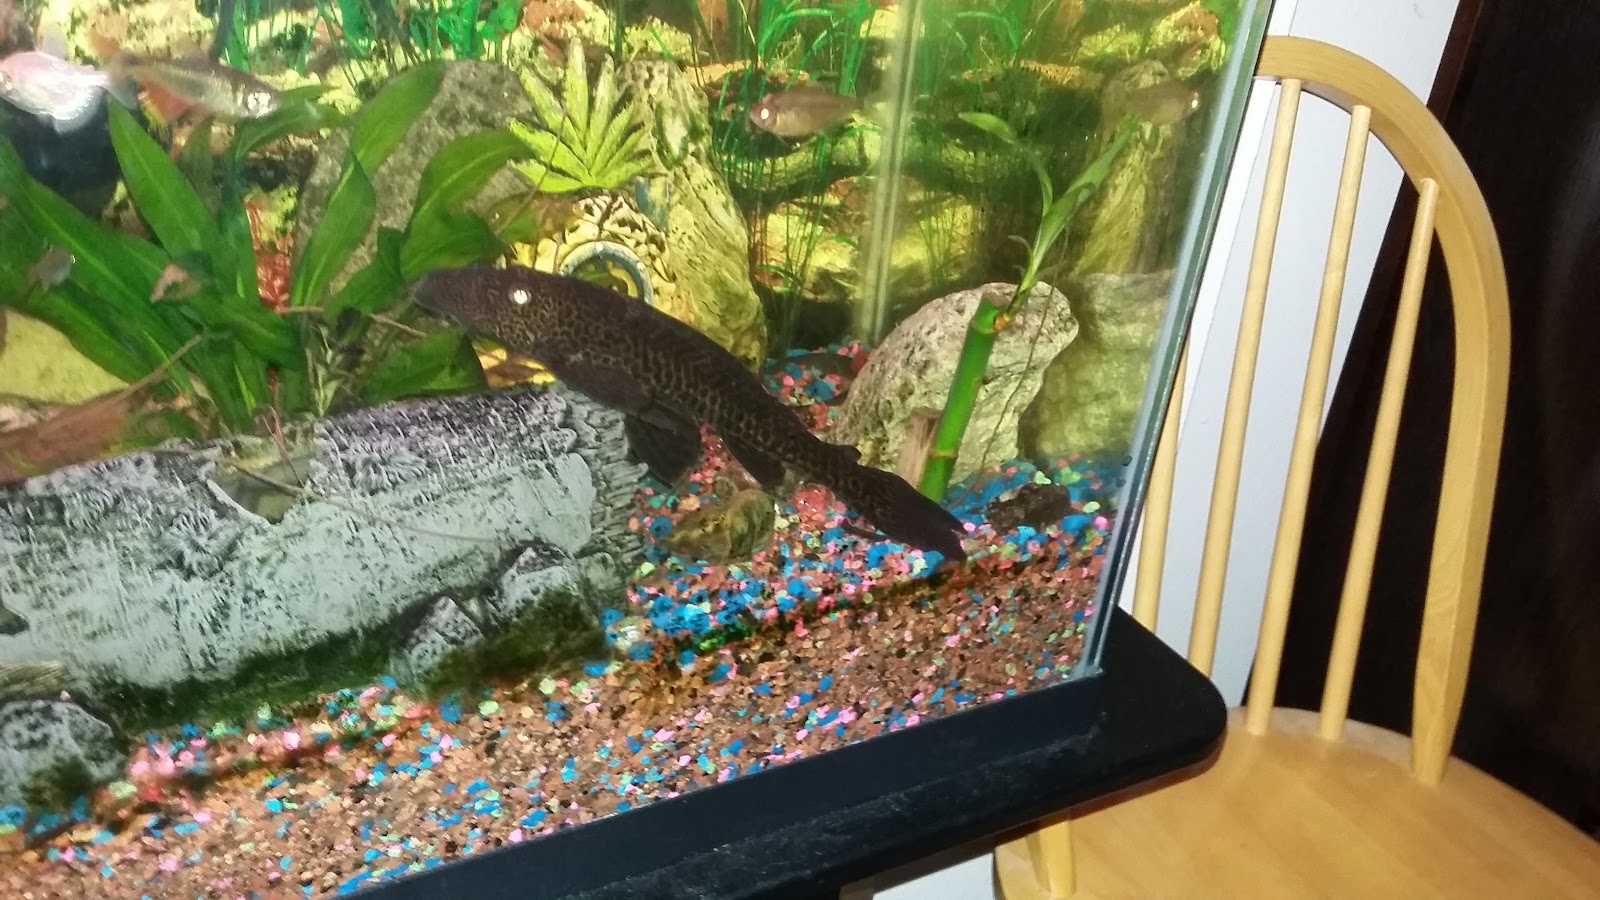 Fish - 20160917_205532.jpg